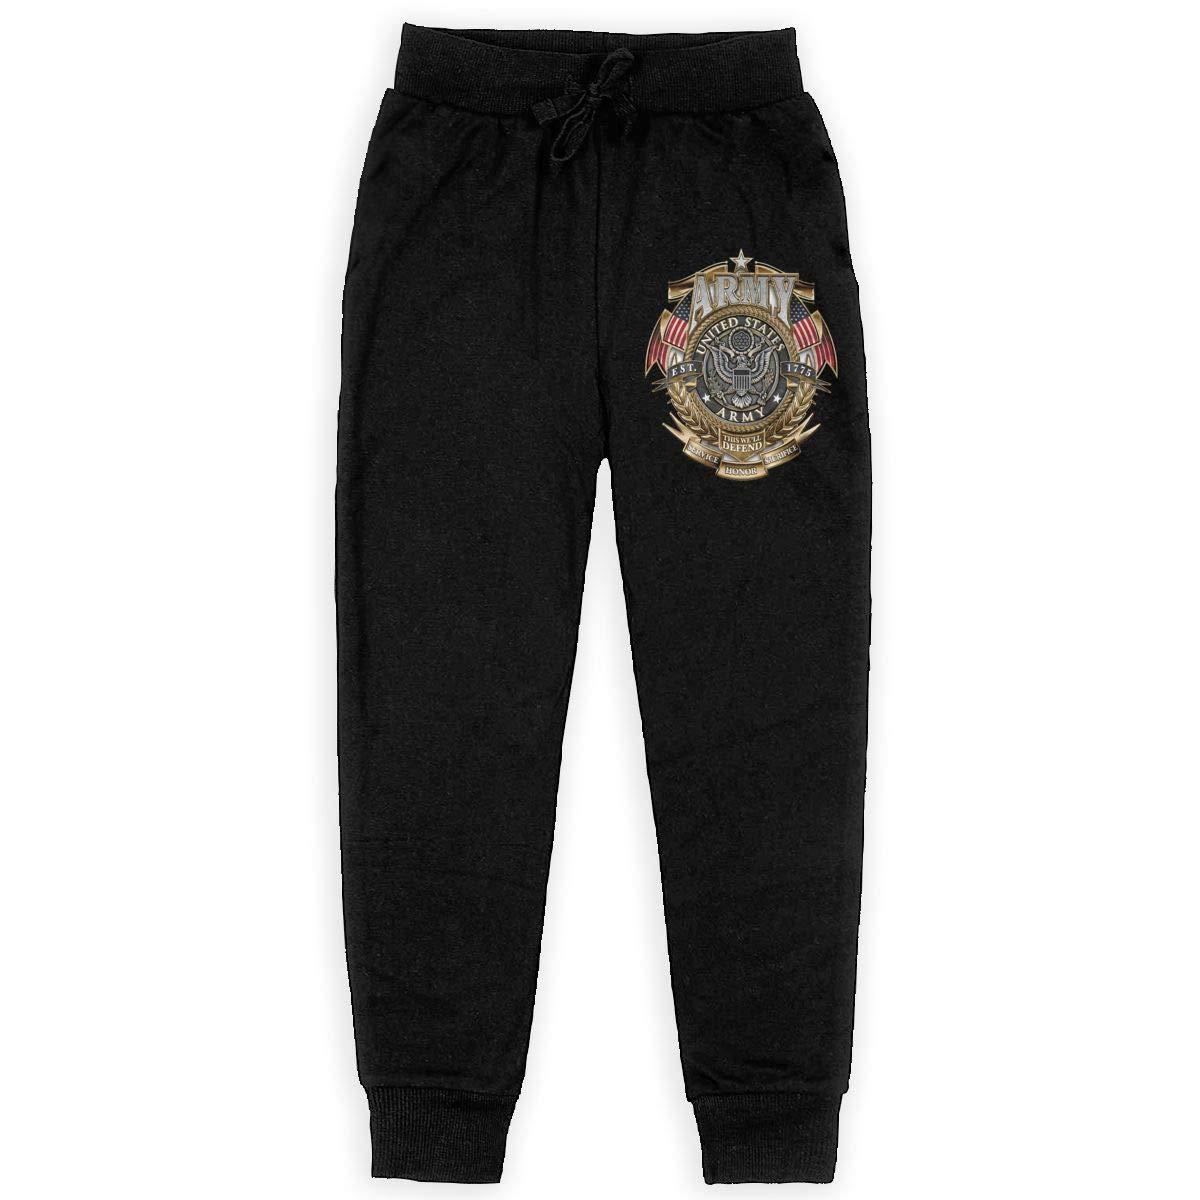 United States Army Service Honor Sacrifice Boys Sweatpants Boys Athletic Pants Boys Jogger Pants Black